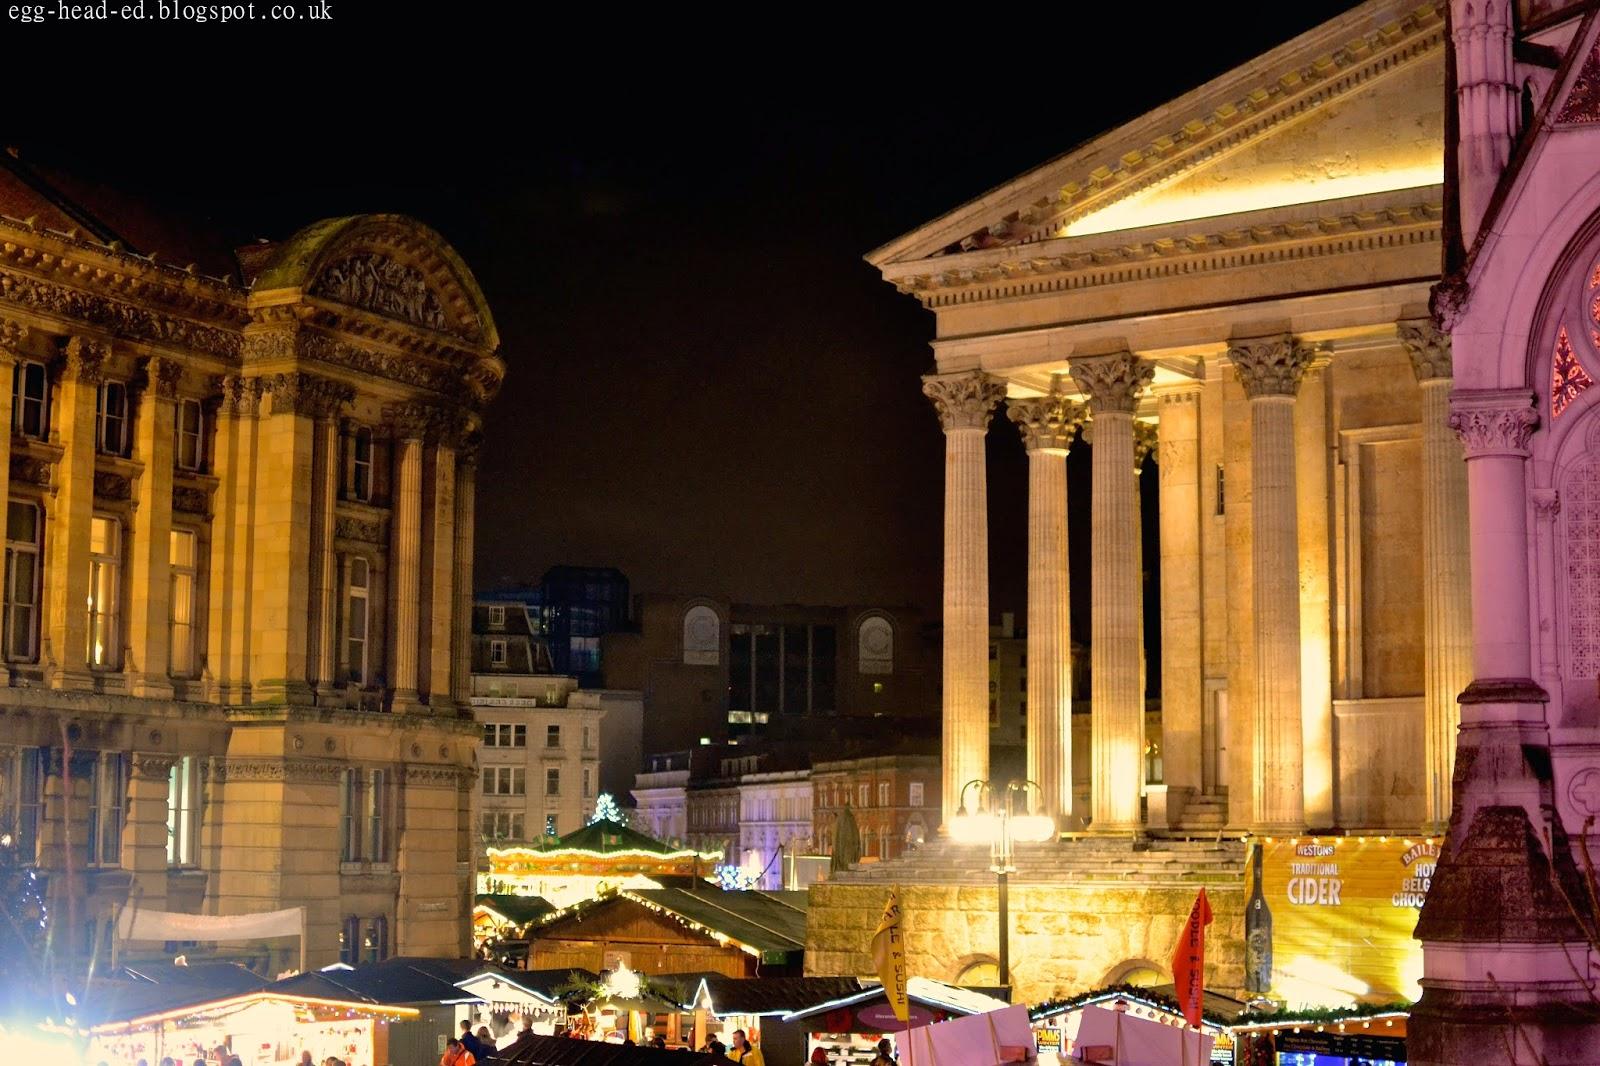 Birmingham Christmas Market Craft Stalls